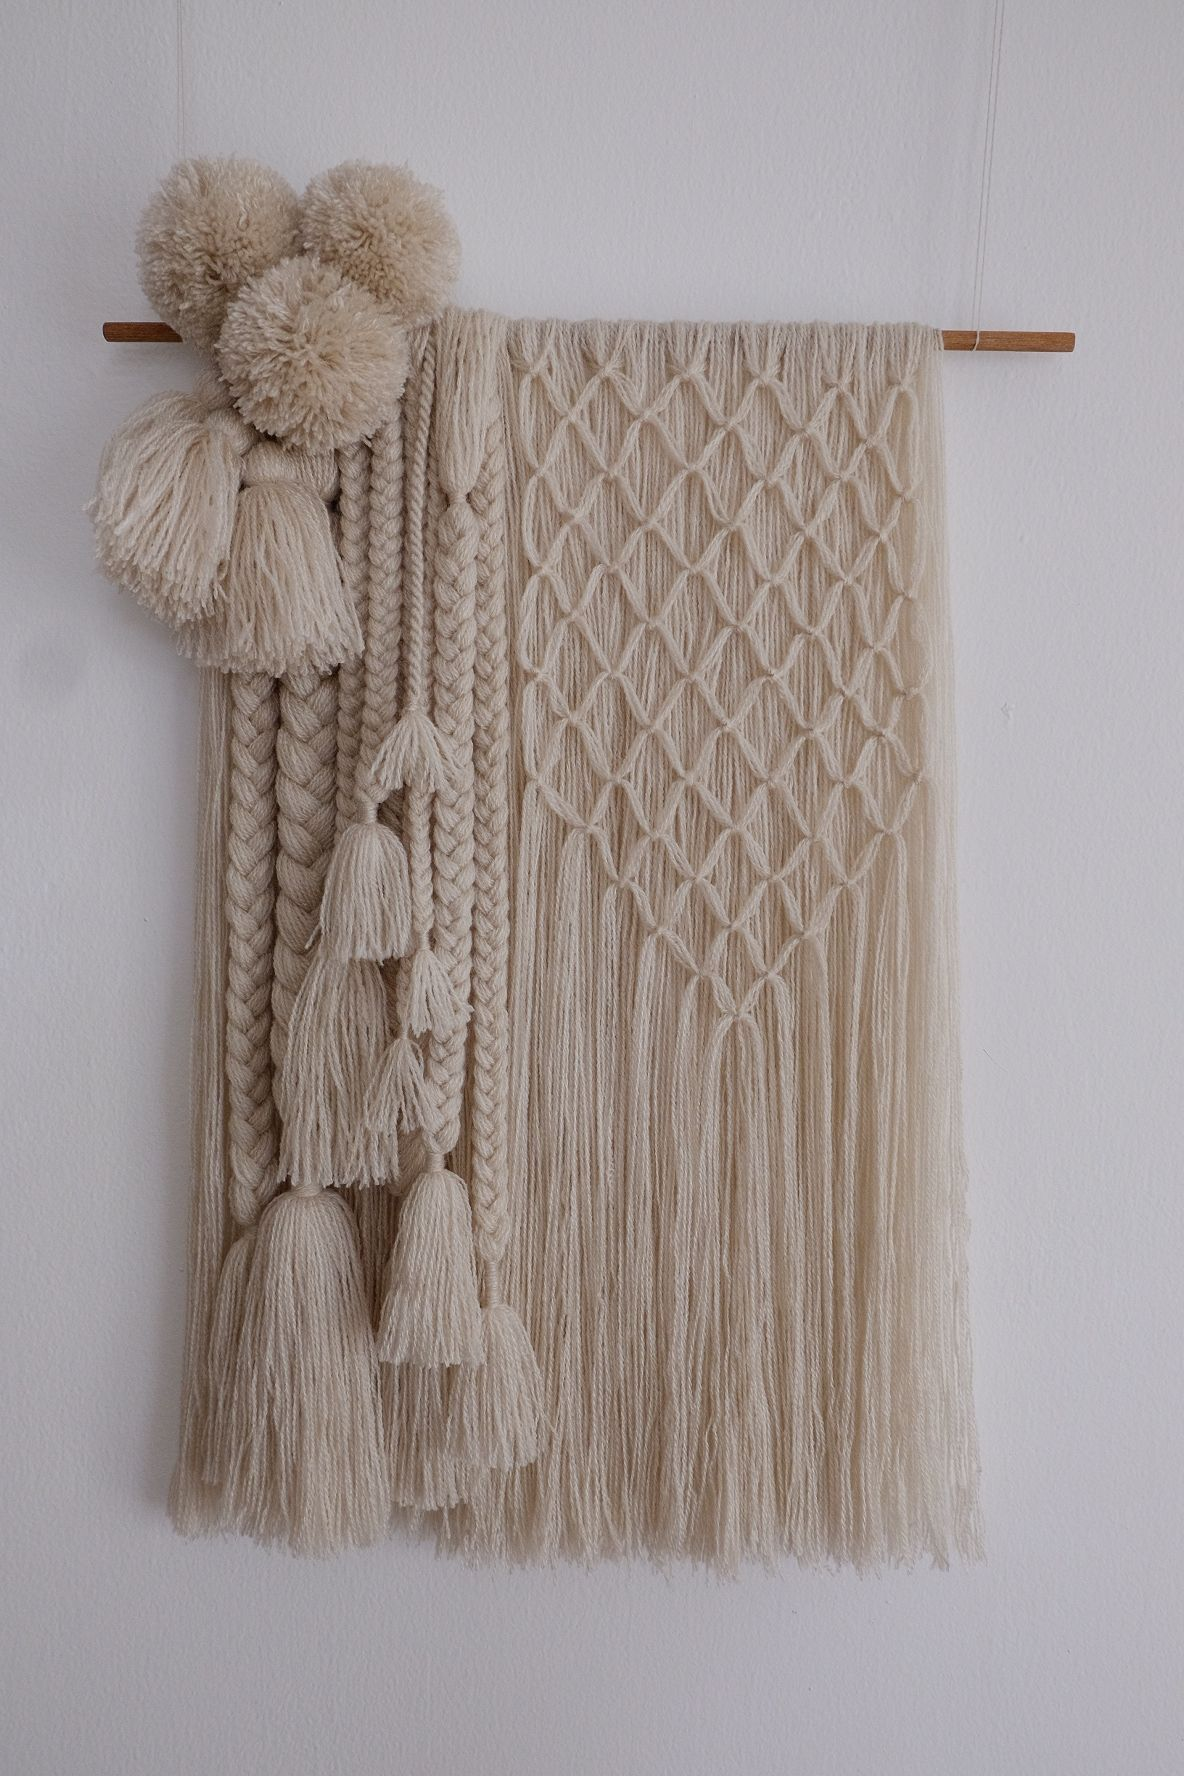 Pin By Chris Of Chrissywear On Crochet Yarn Hanging Diy Wall Hanging Yarn Wool Wall Hanging